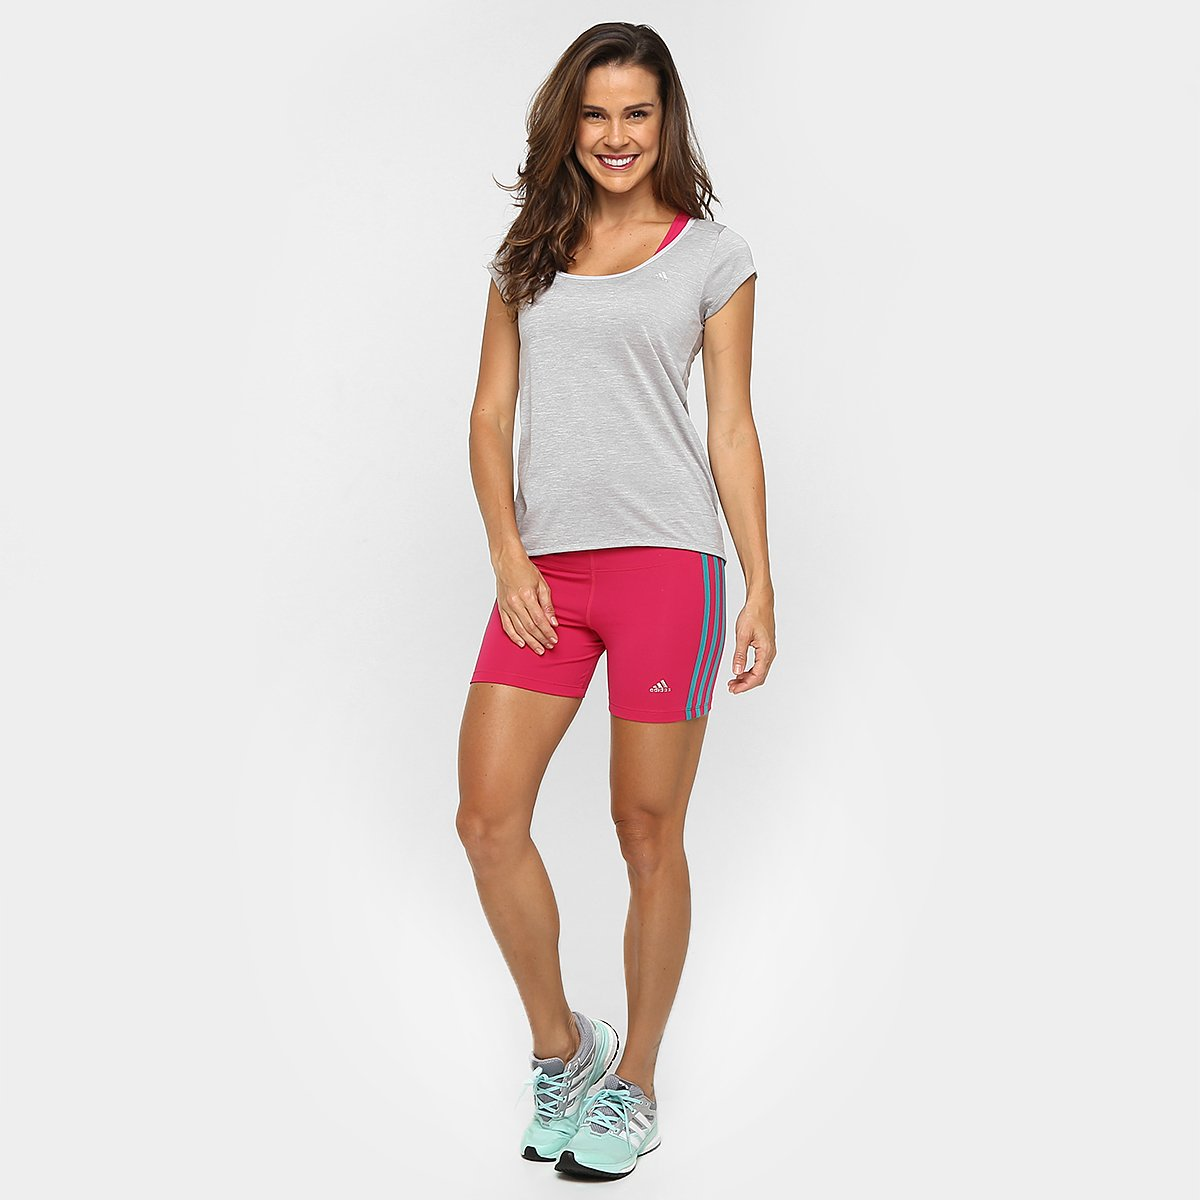 Mescla Camiseta Adidas Feminina Ess Clima Cinza Camiseta Adidas wZXqdOO